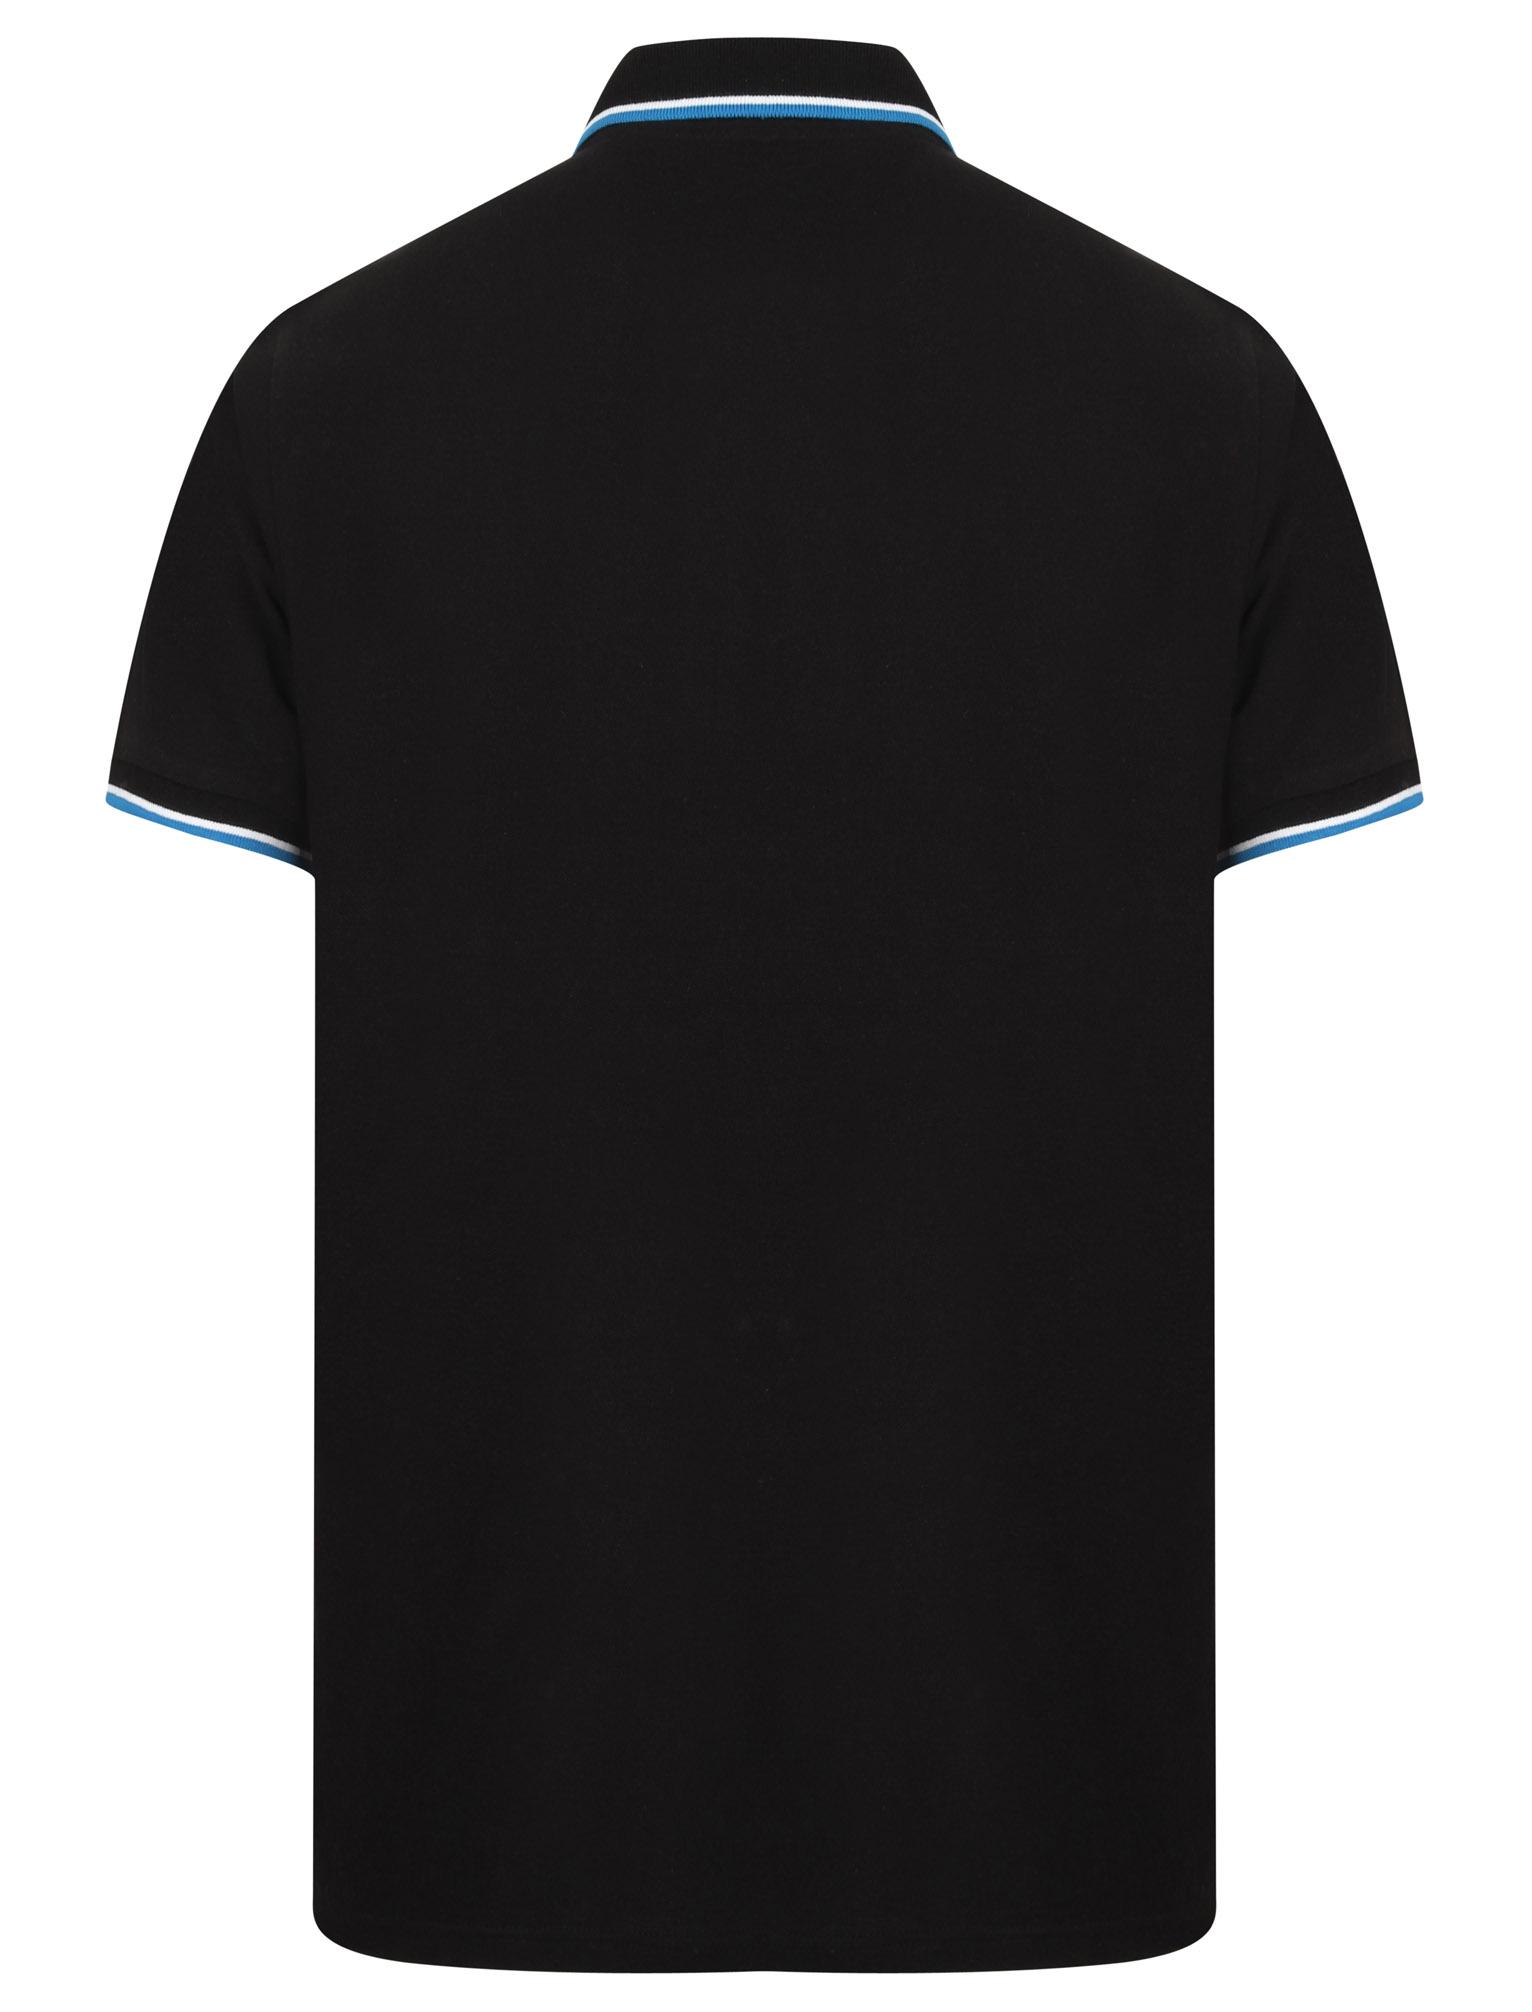 Sth-Shore-Mens-Plain-Polo-Shirt-100-Pique-Cotton-T-Shirt-Top-Collar-Size-M-XXL thumbnail 19